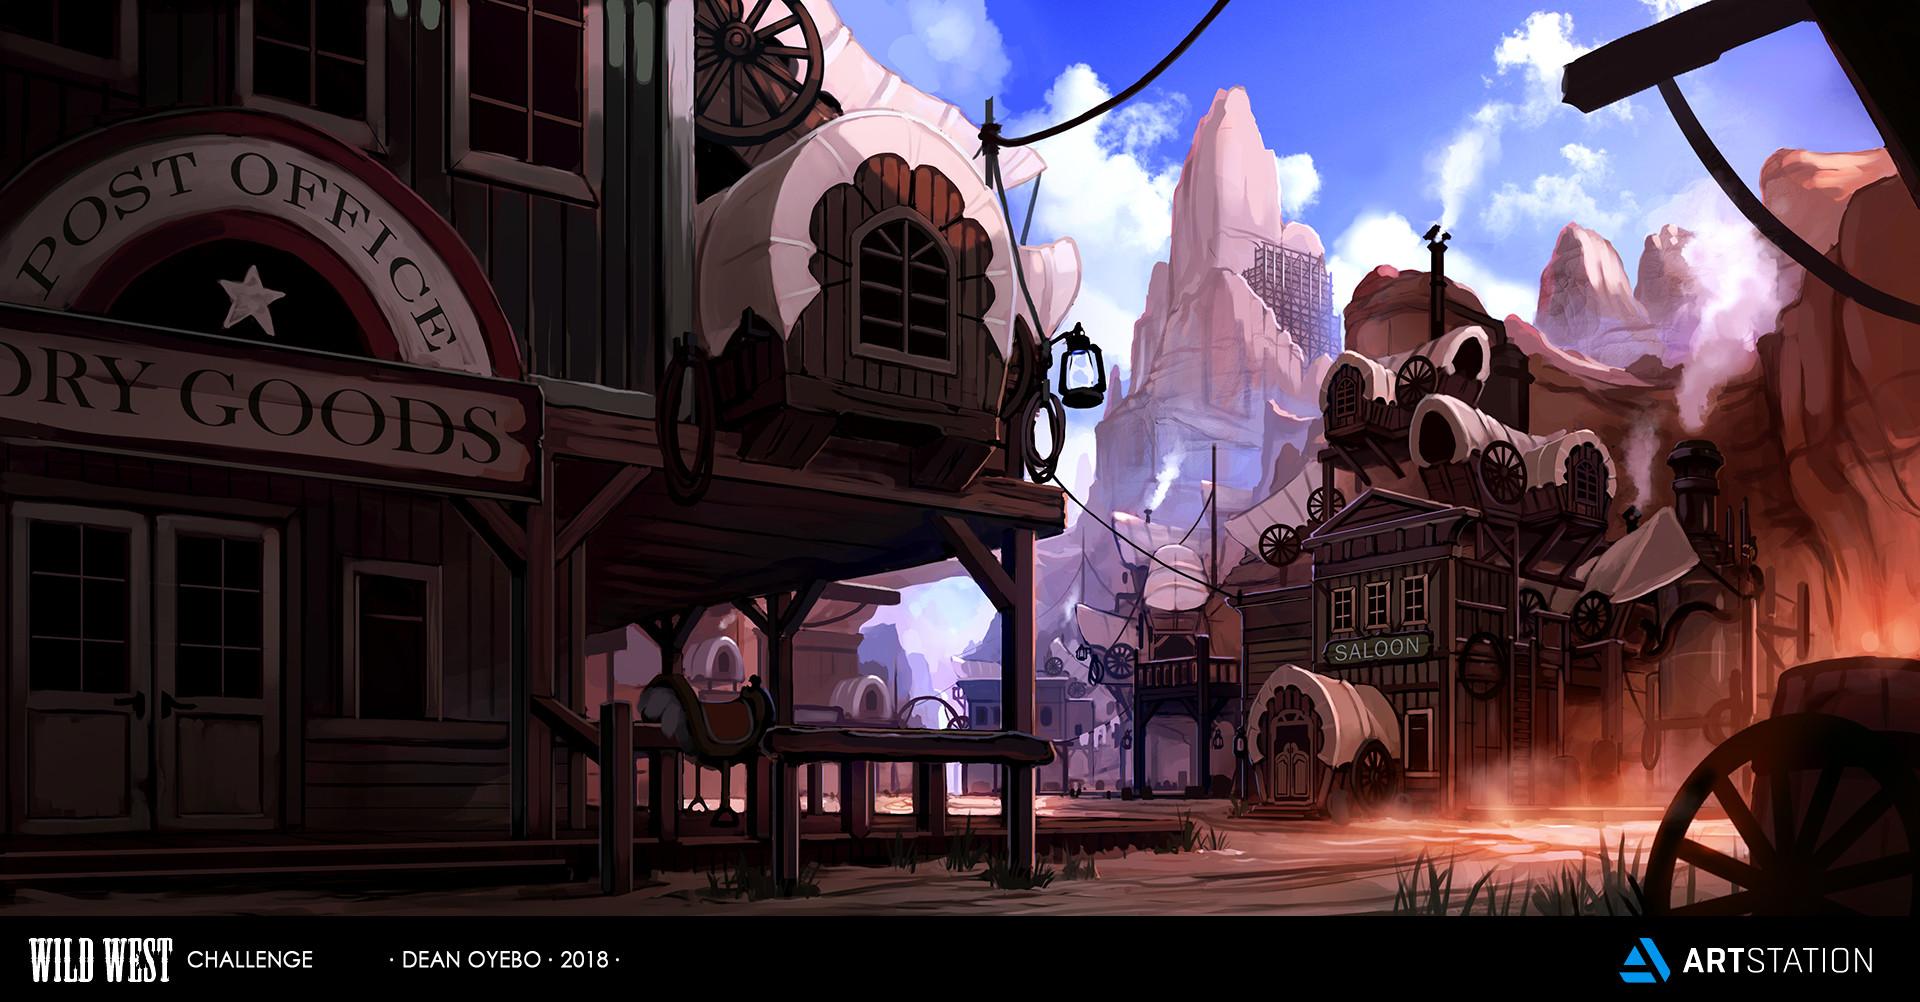 The Town of Asfaraswego